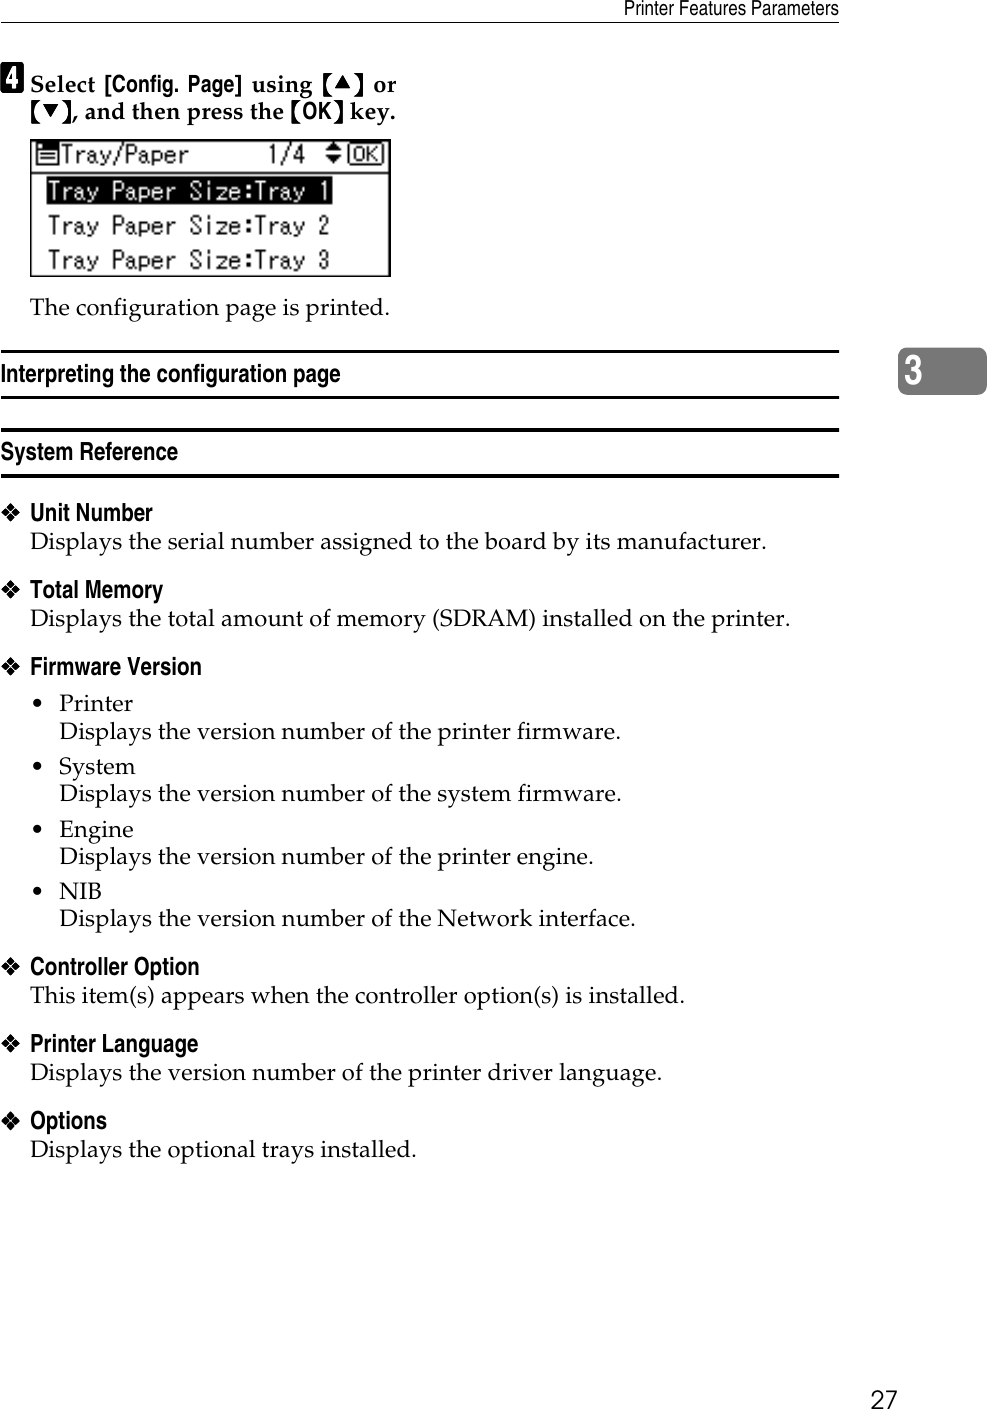 Ricoh 2015 Users Manual Operating Instructions General Settings Guide